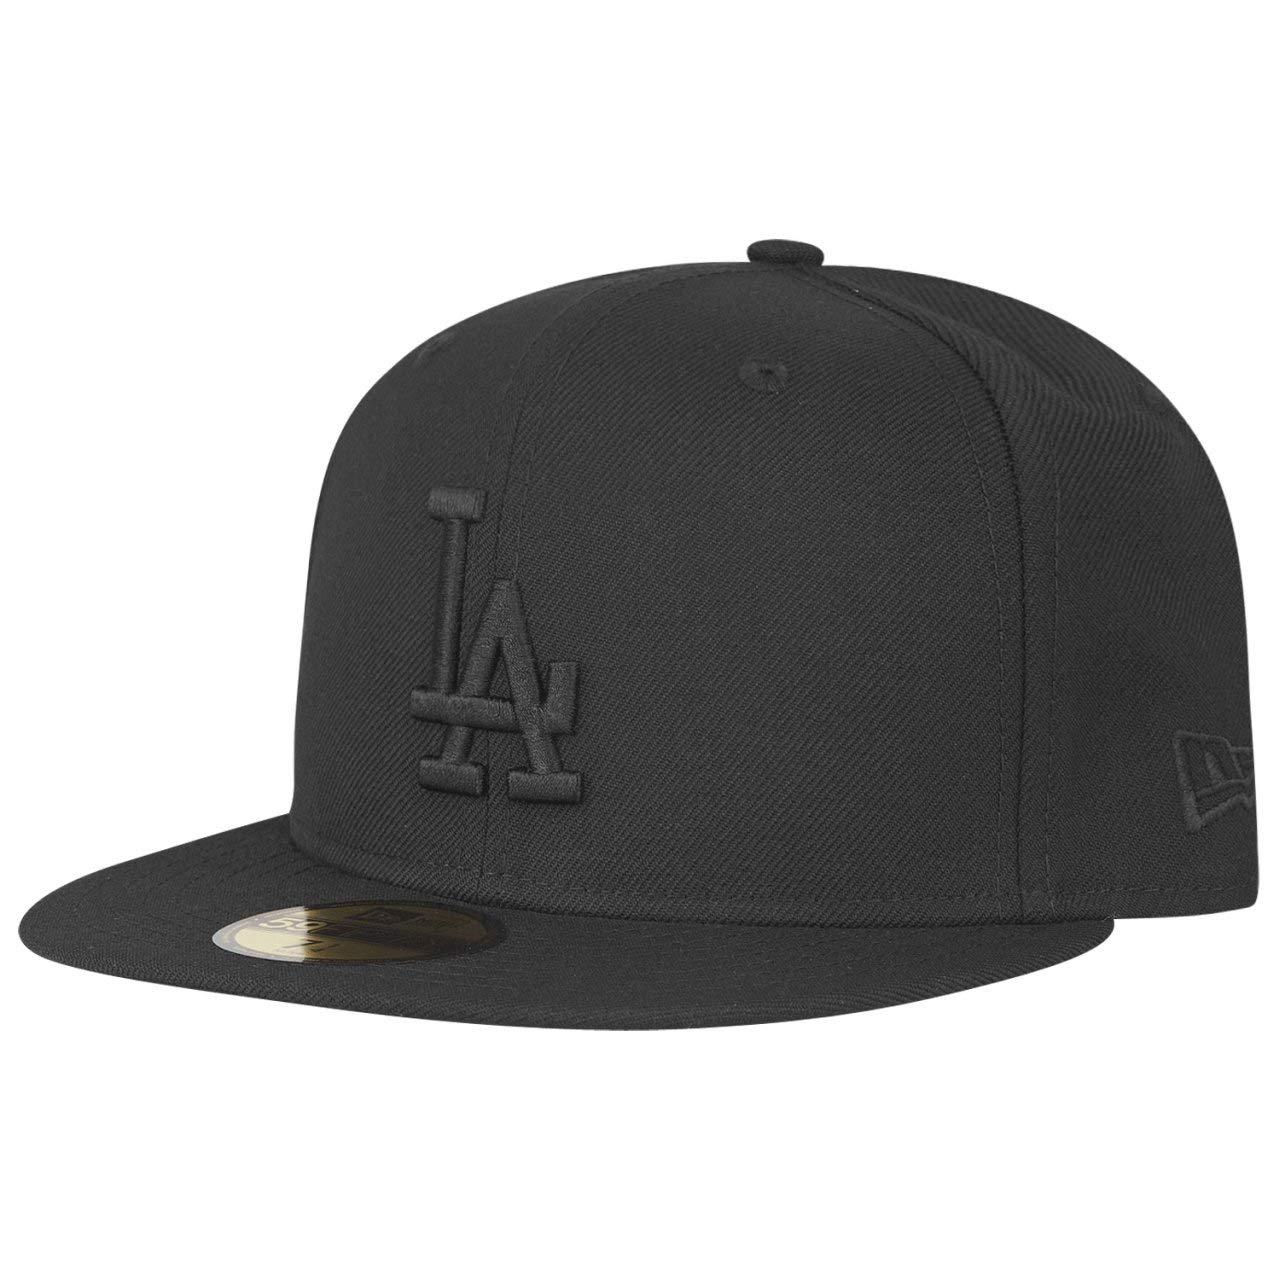 d11a8d9fd Amazon.com : New Era 59Fifty Los Angeles LA Dodgers Blackout Fitted ...